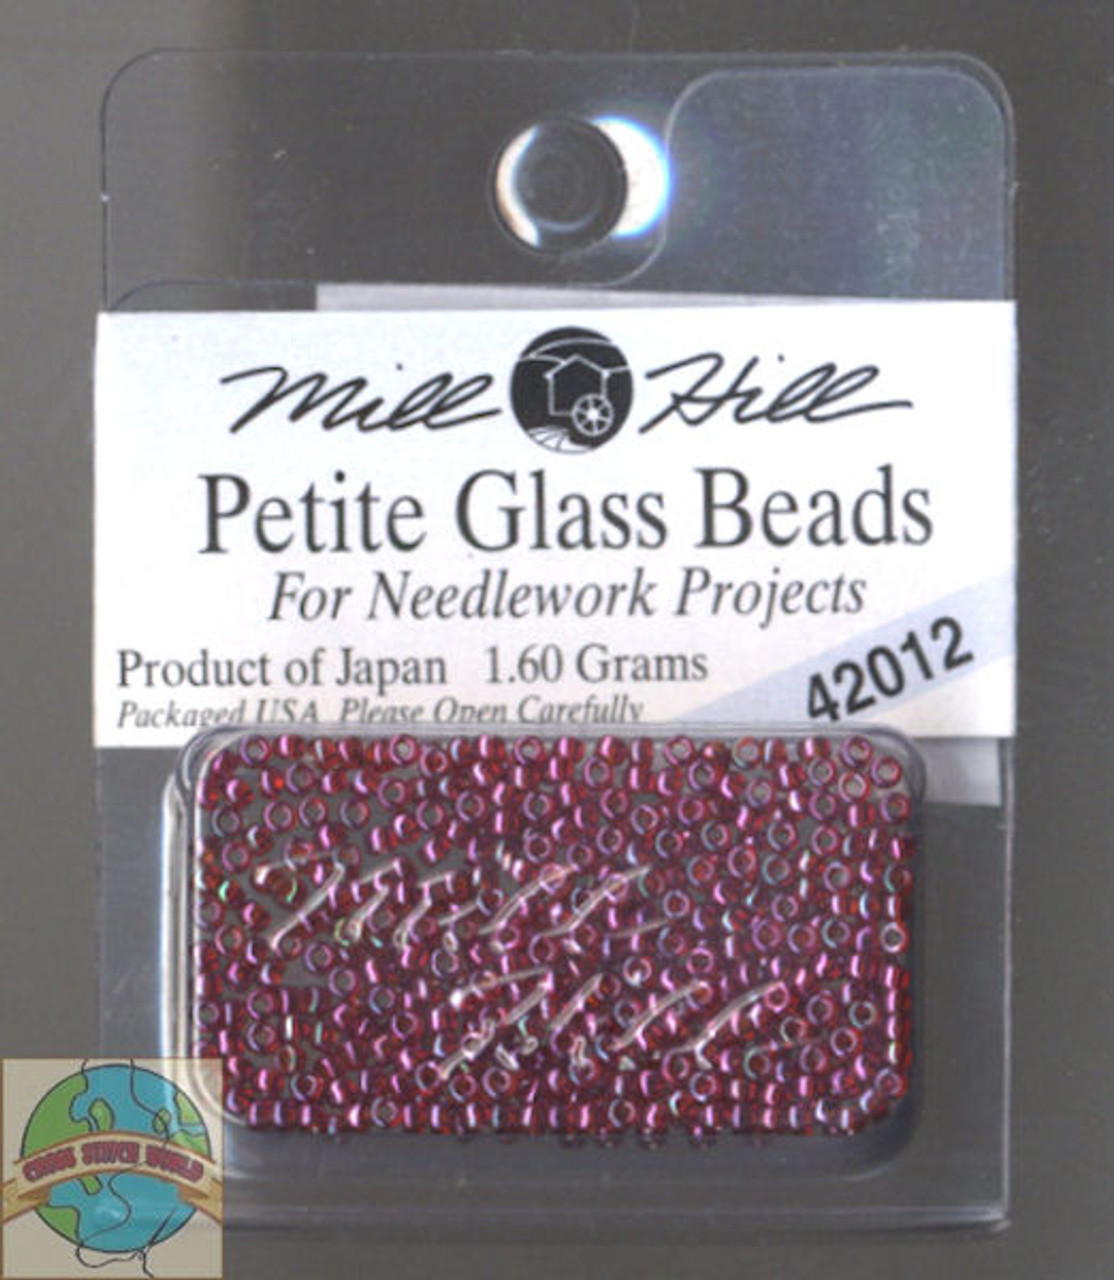 Mill Hill Petite Glass Beads 1.60g Royal Plum #42012